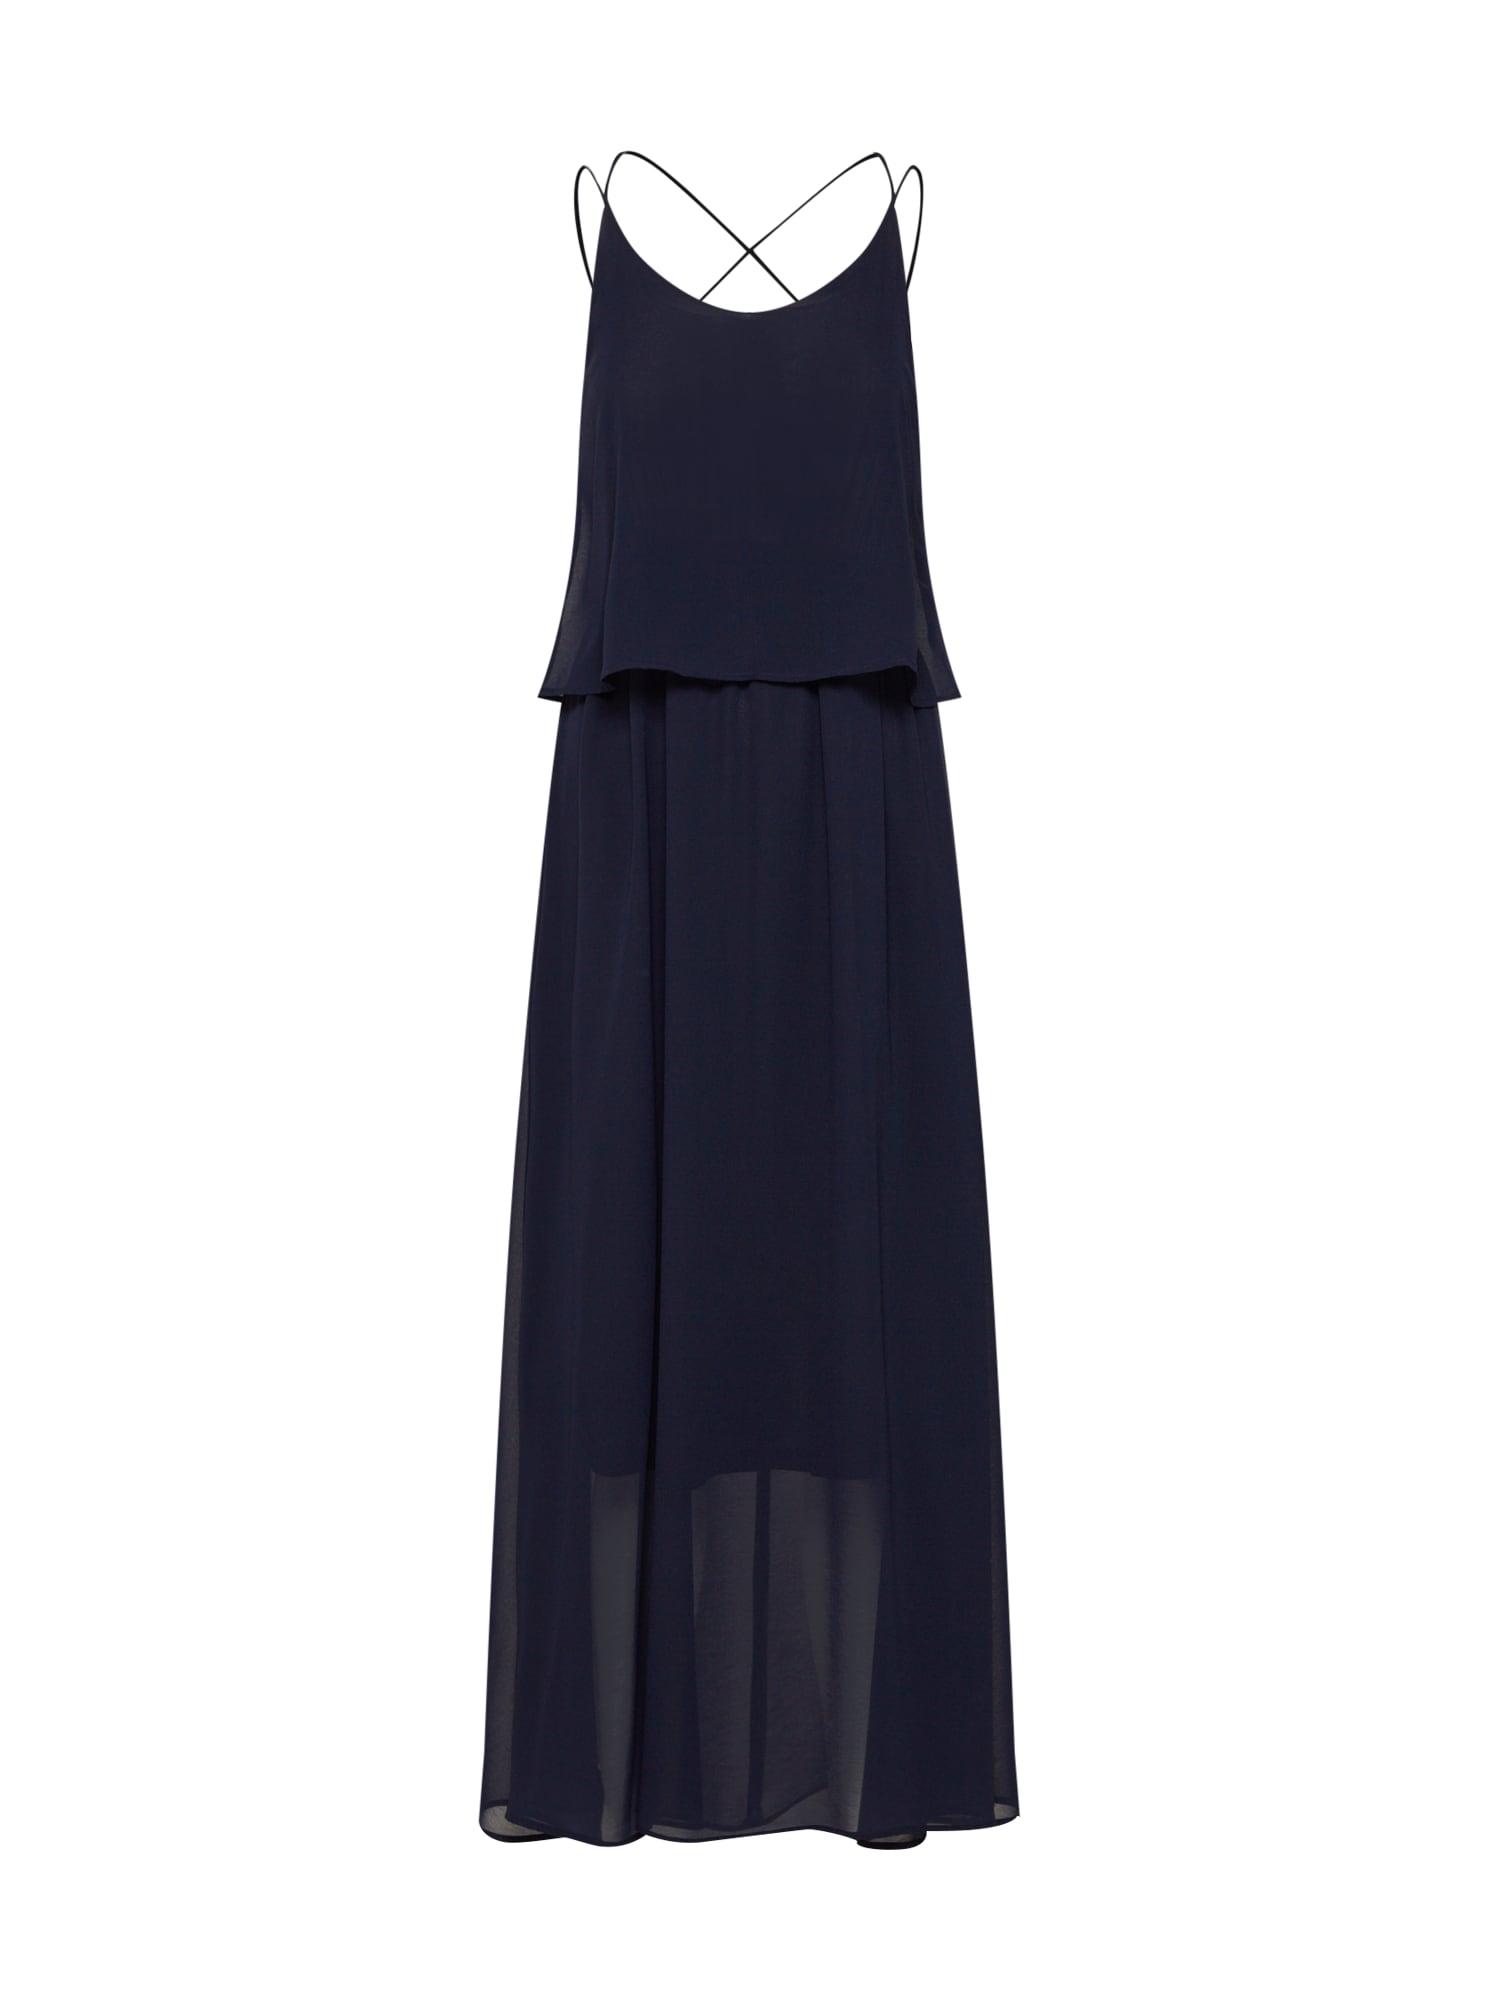 Společenské šaty BARBARA noční modrá VERO MODA